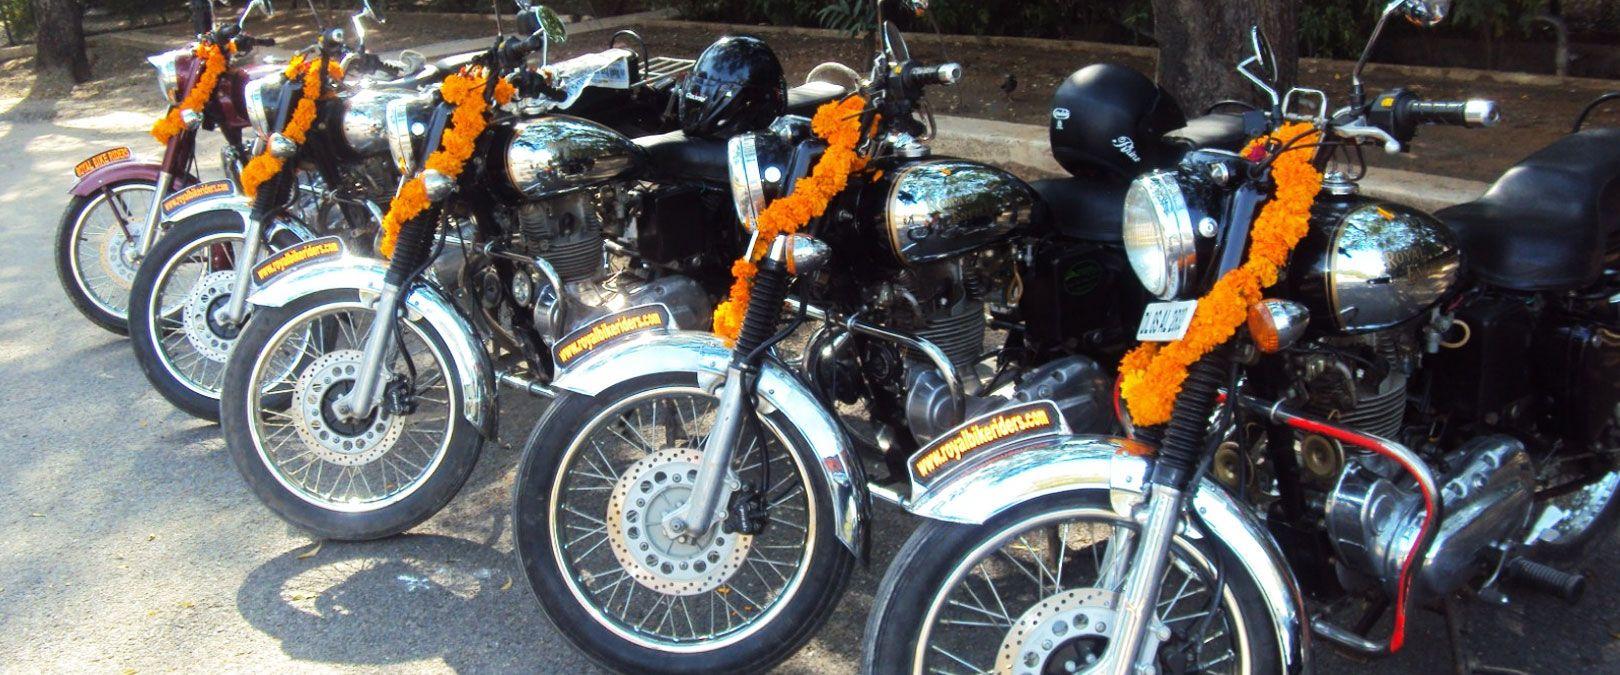 Royal Enfield Trip To Nepal Rajasthan Tour Travel India